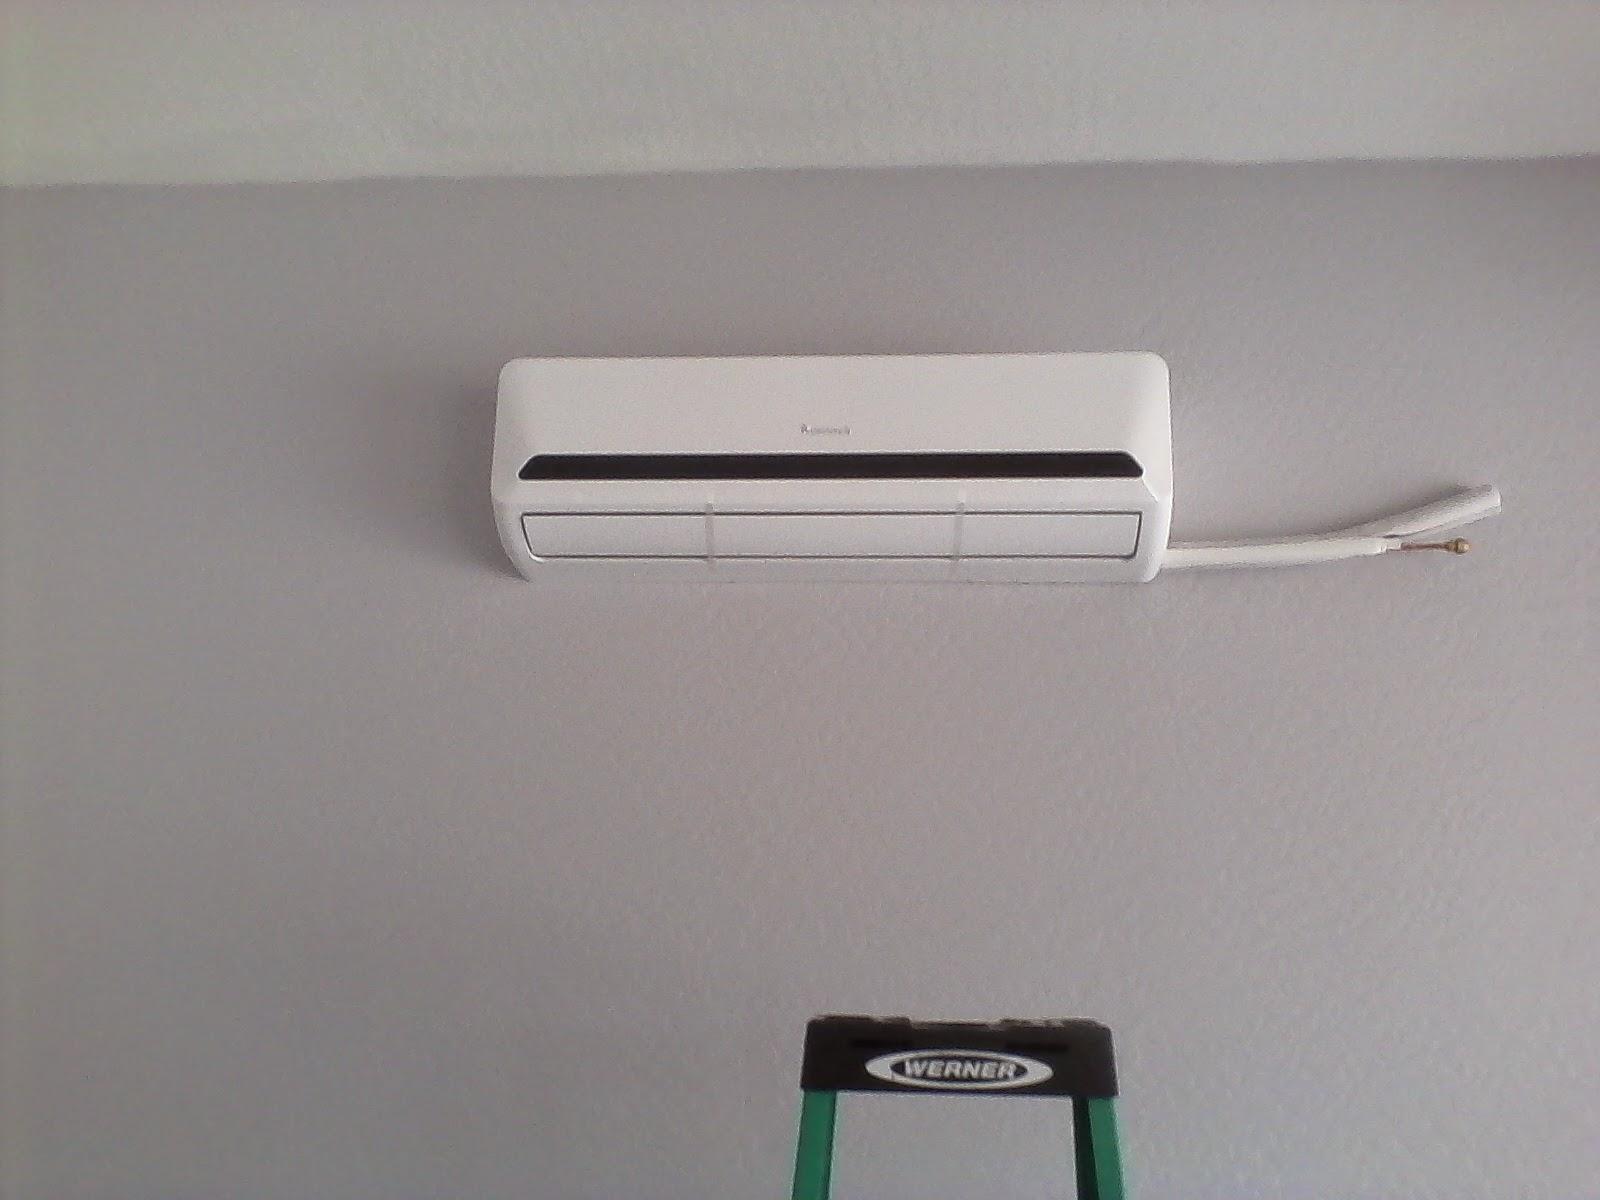 klimaire mini split wiring diagram ductless mini split wiring diagrams